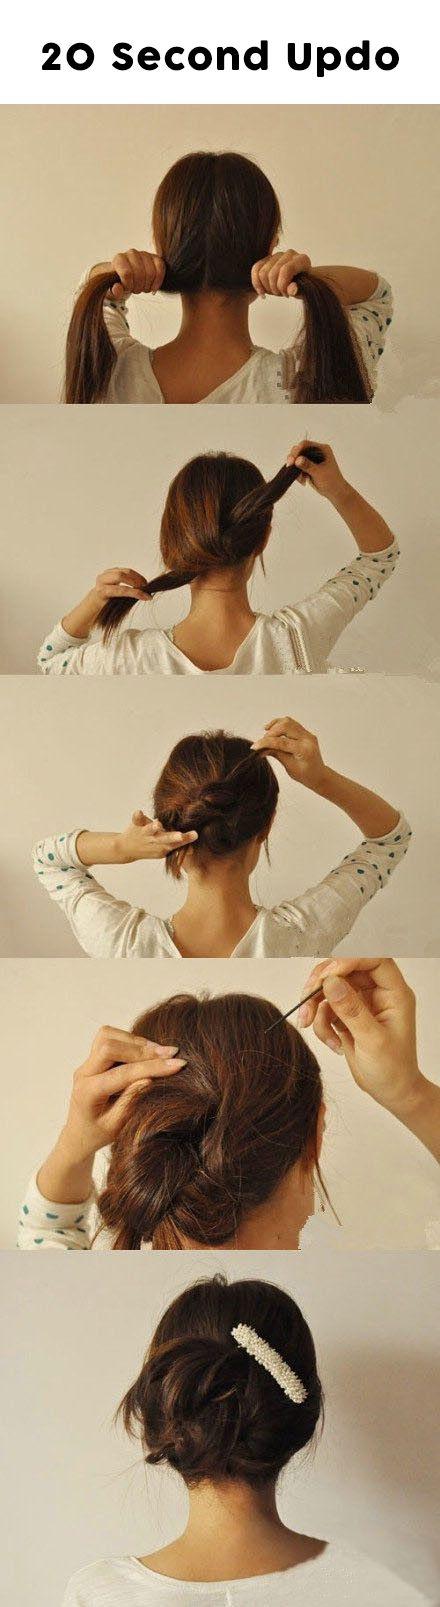 20 Second Updo - #Beauty, #Hair, #Updo